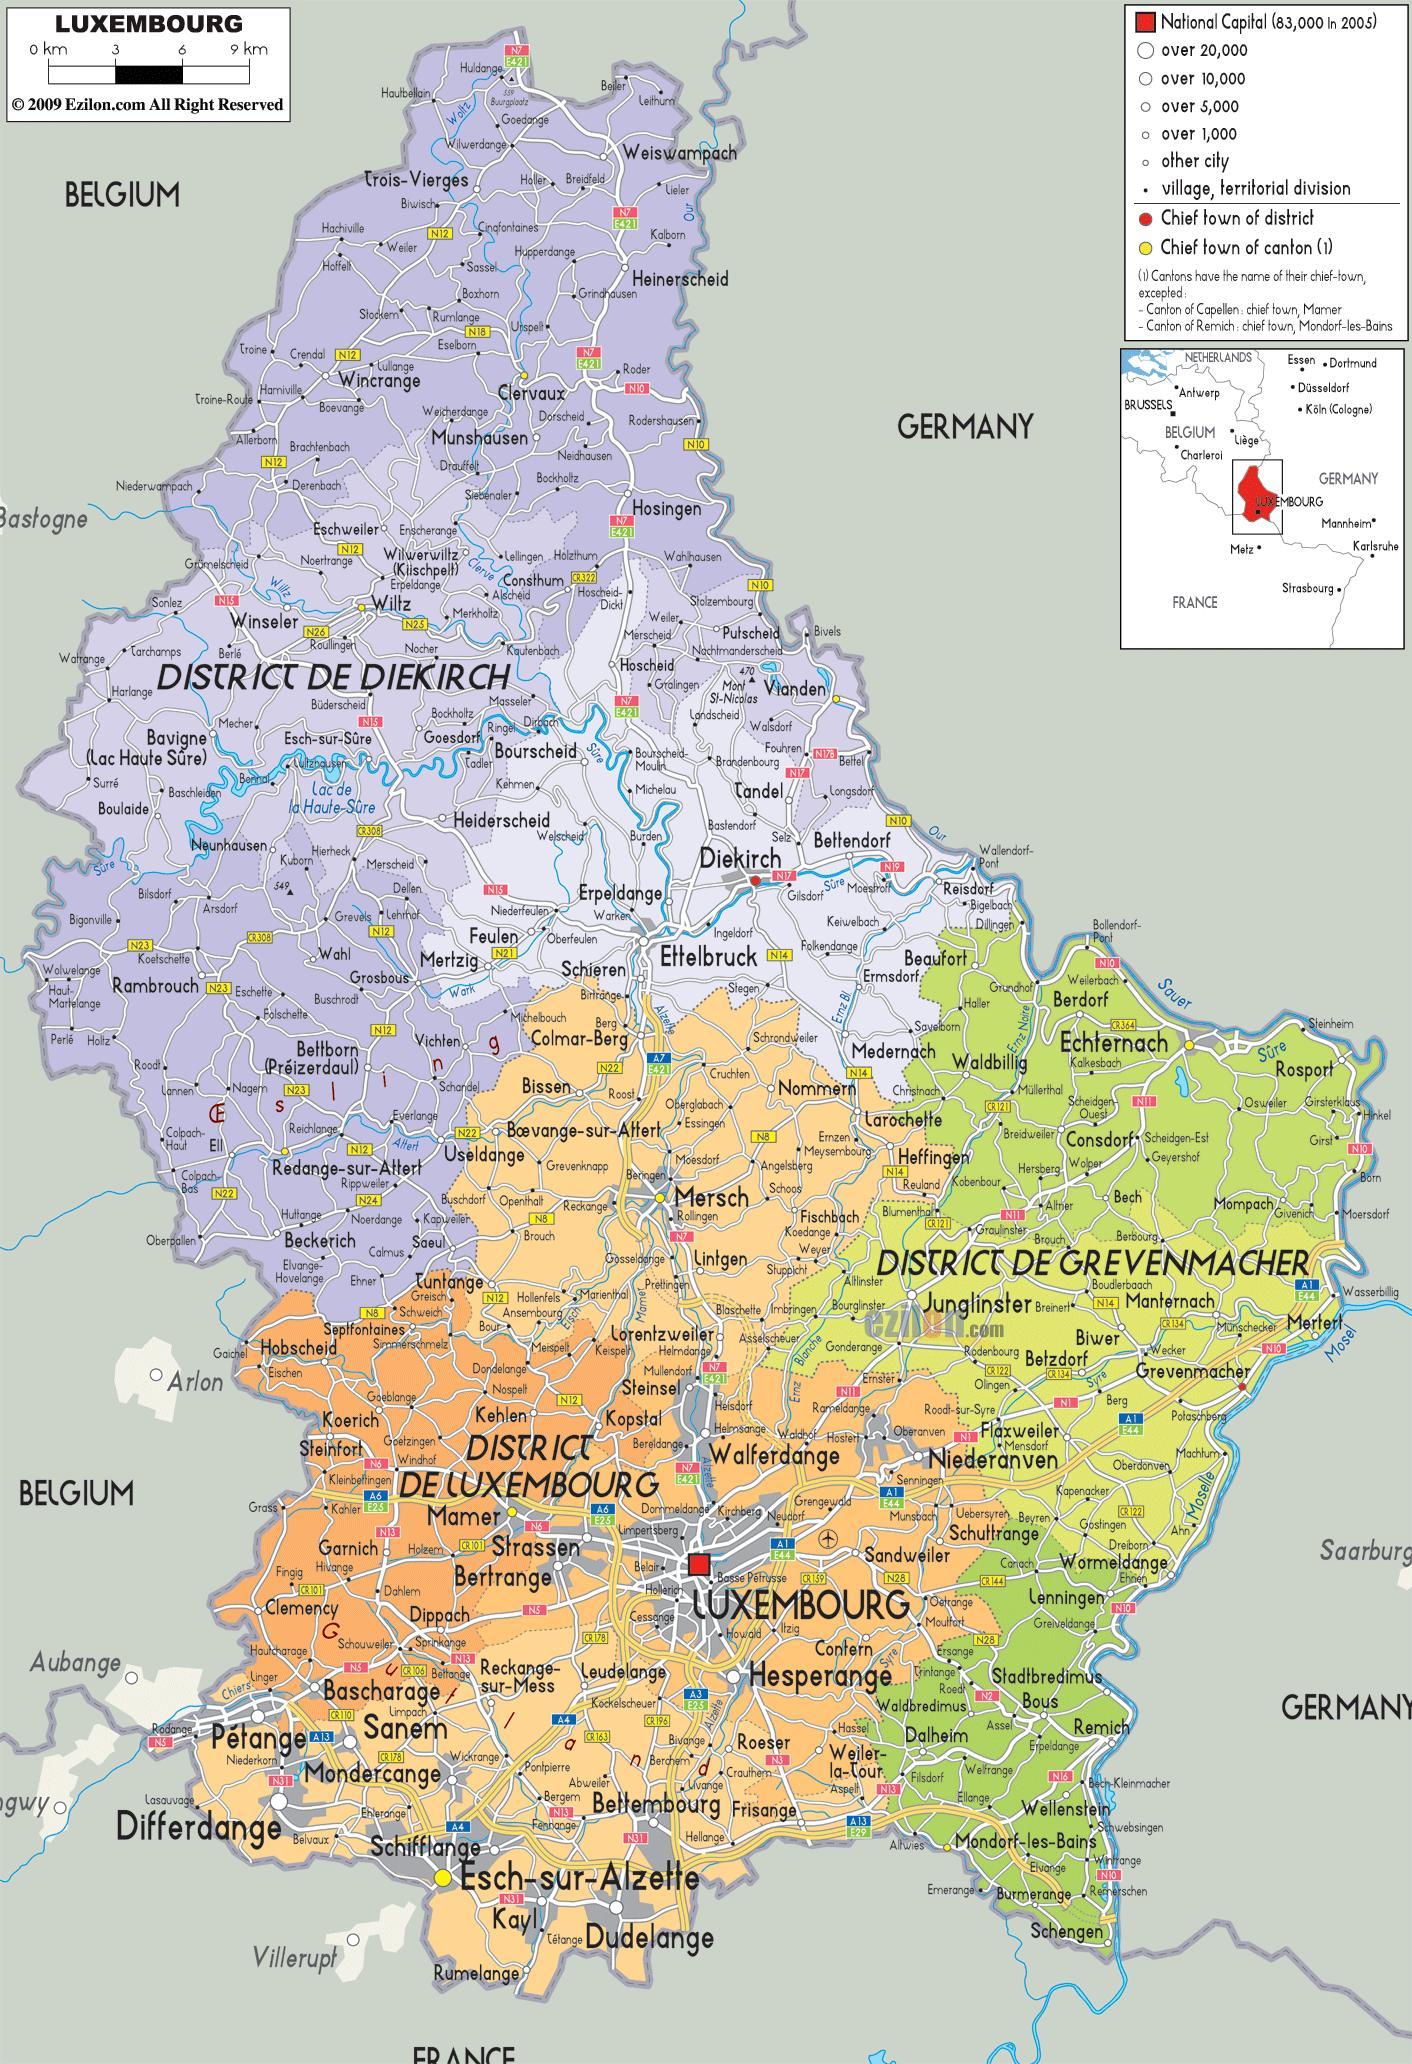 Kort Over Luxembourg Luxembourg Land Kort Det Vestlige Europa